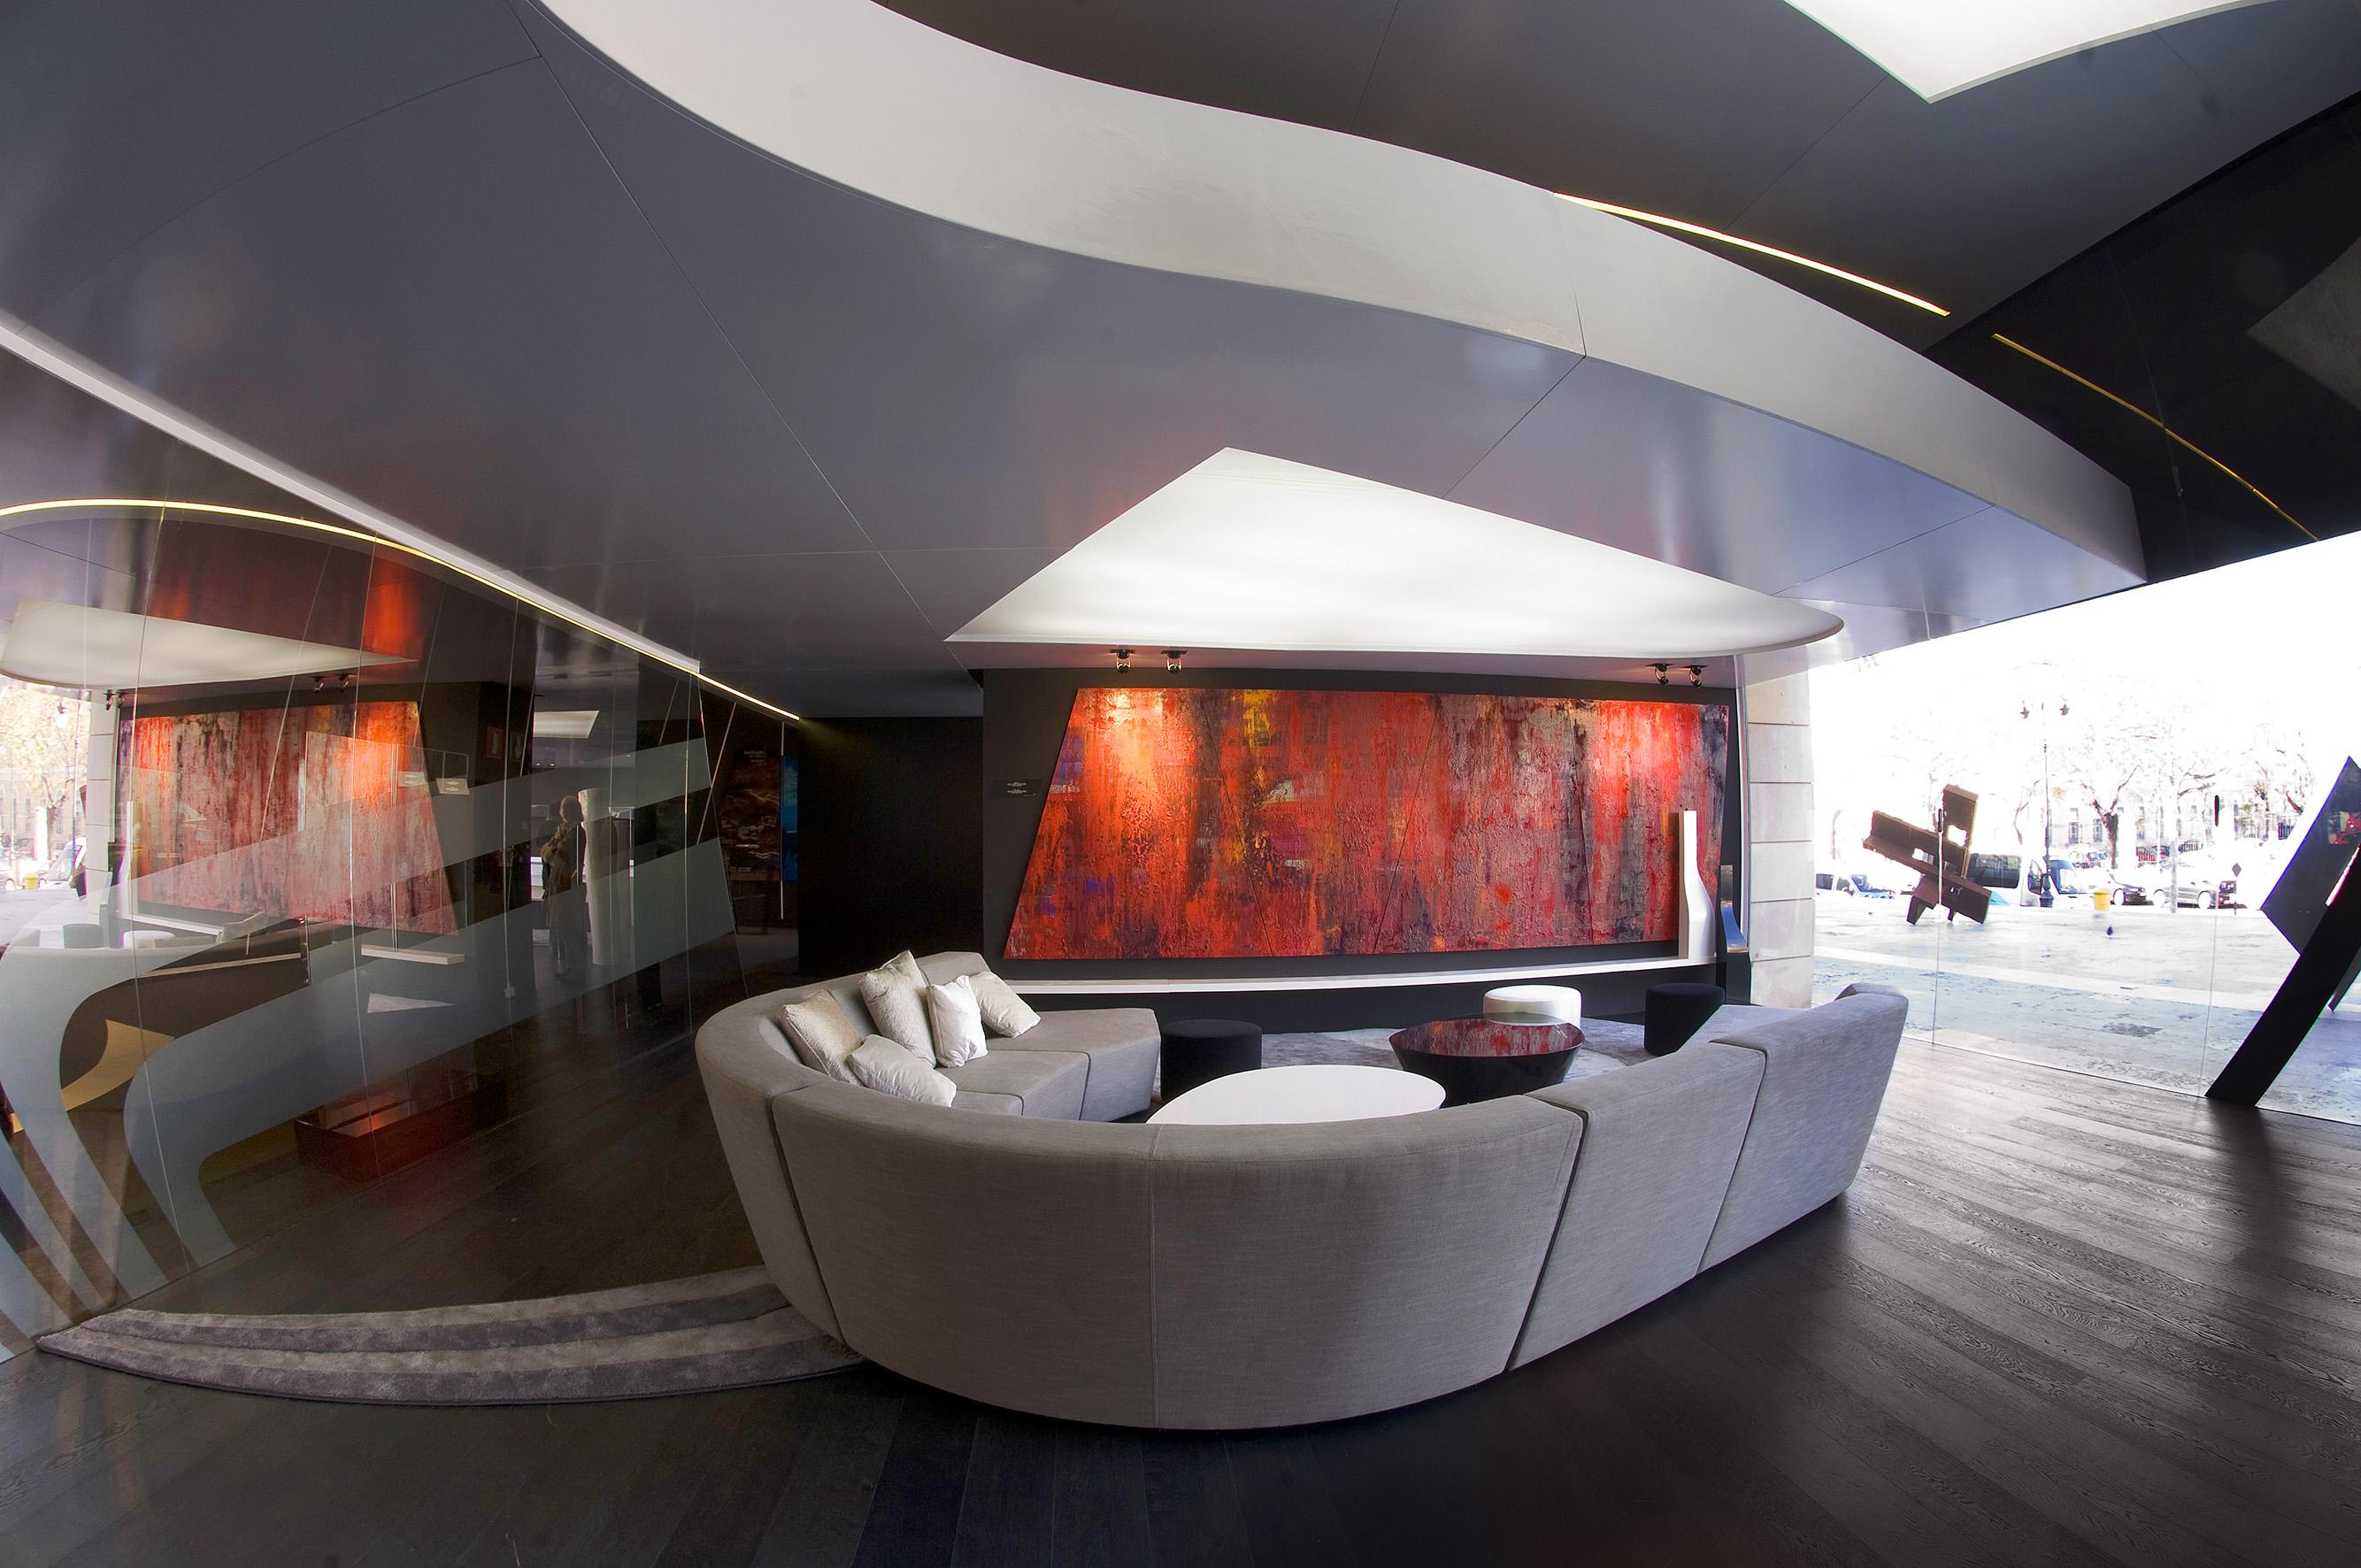 Vivir en la arquitectura de joaqu n torres for Casas modulares de diseno joaquin torres